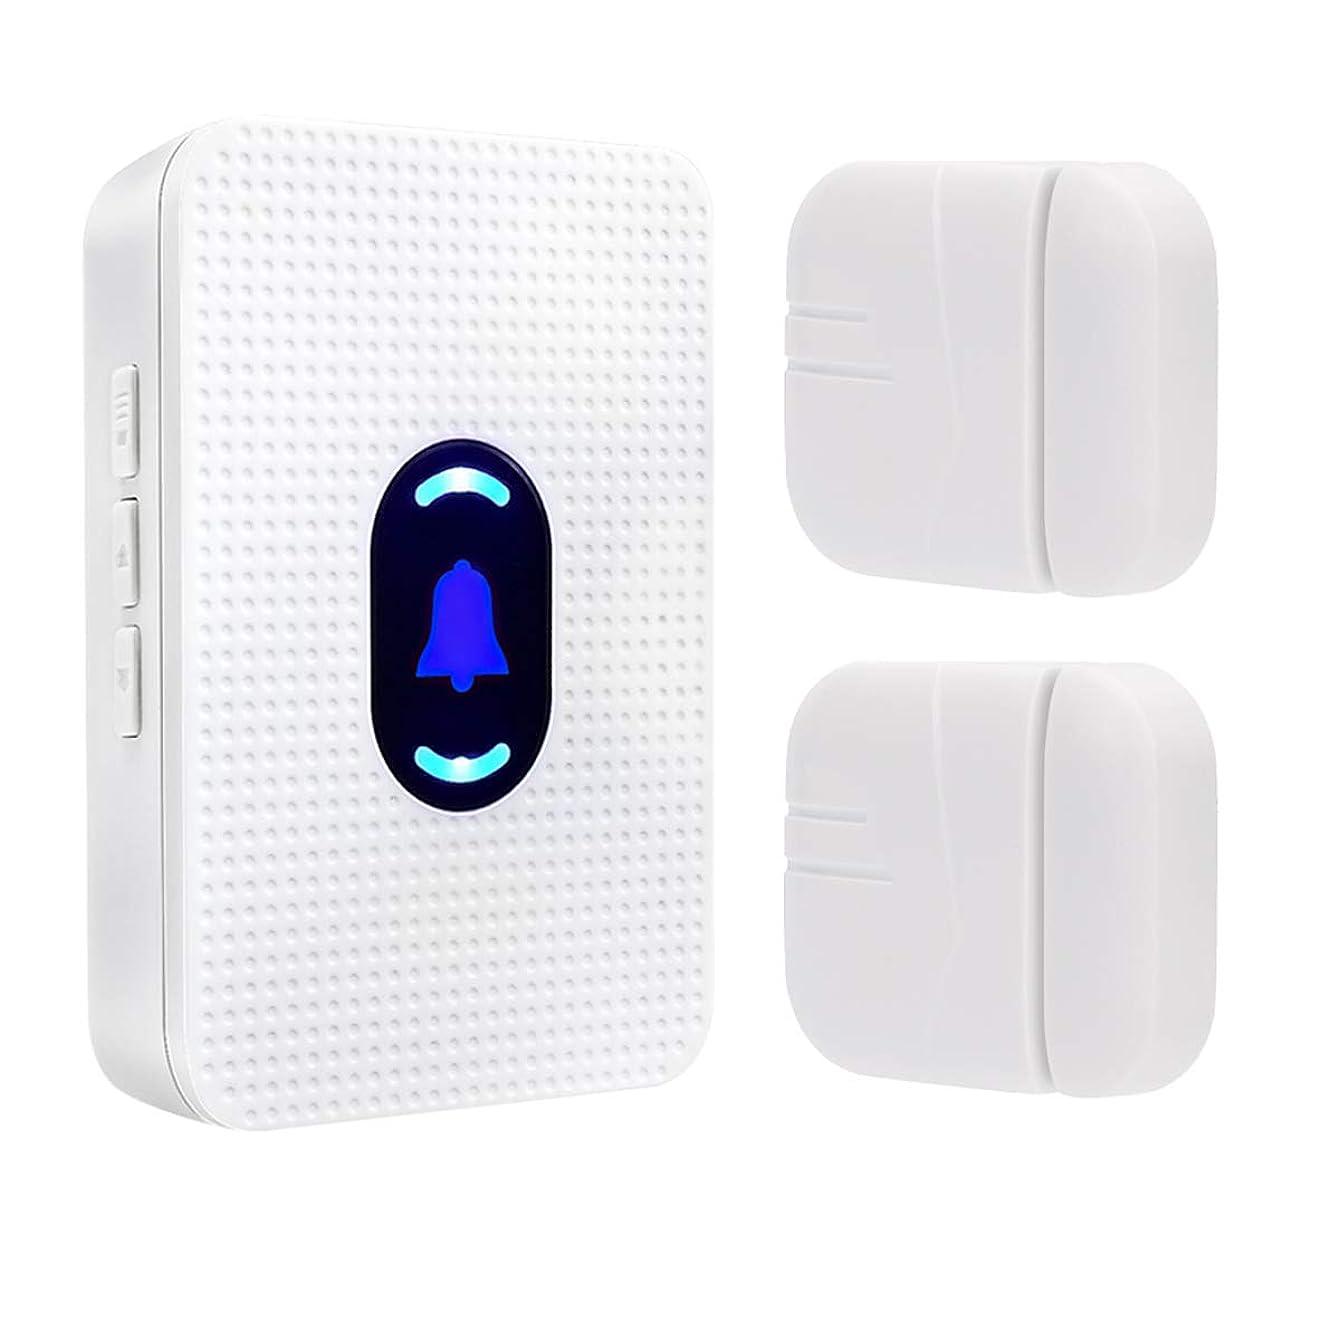 Door Window Open Chime Entry Alert Wireless Door Sensor For Home Store Apartment Office Entrance 2 Magnetic Sensor & 1 Receiver